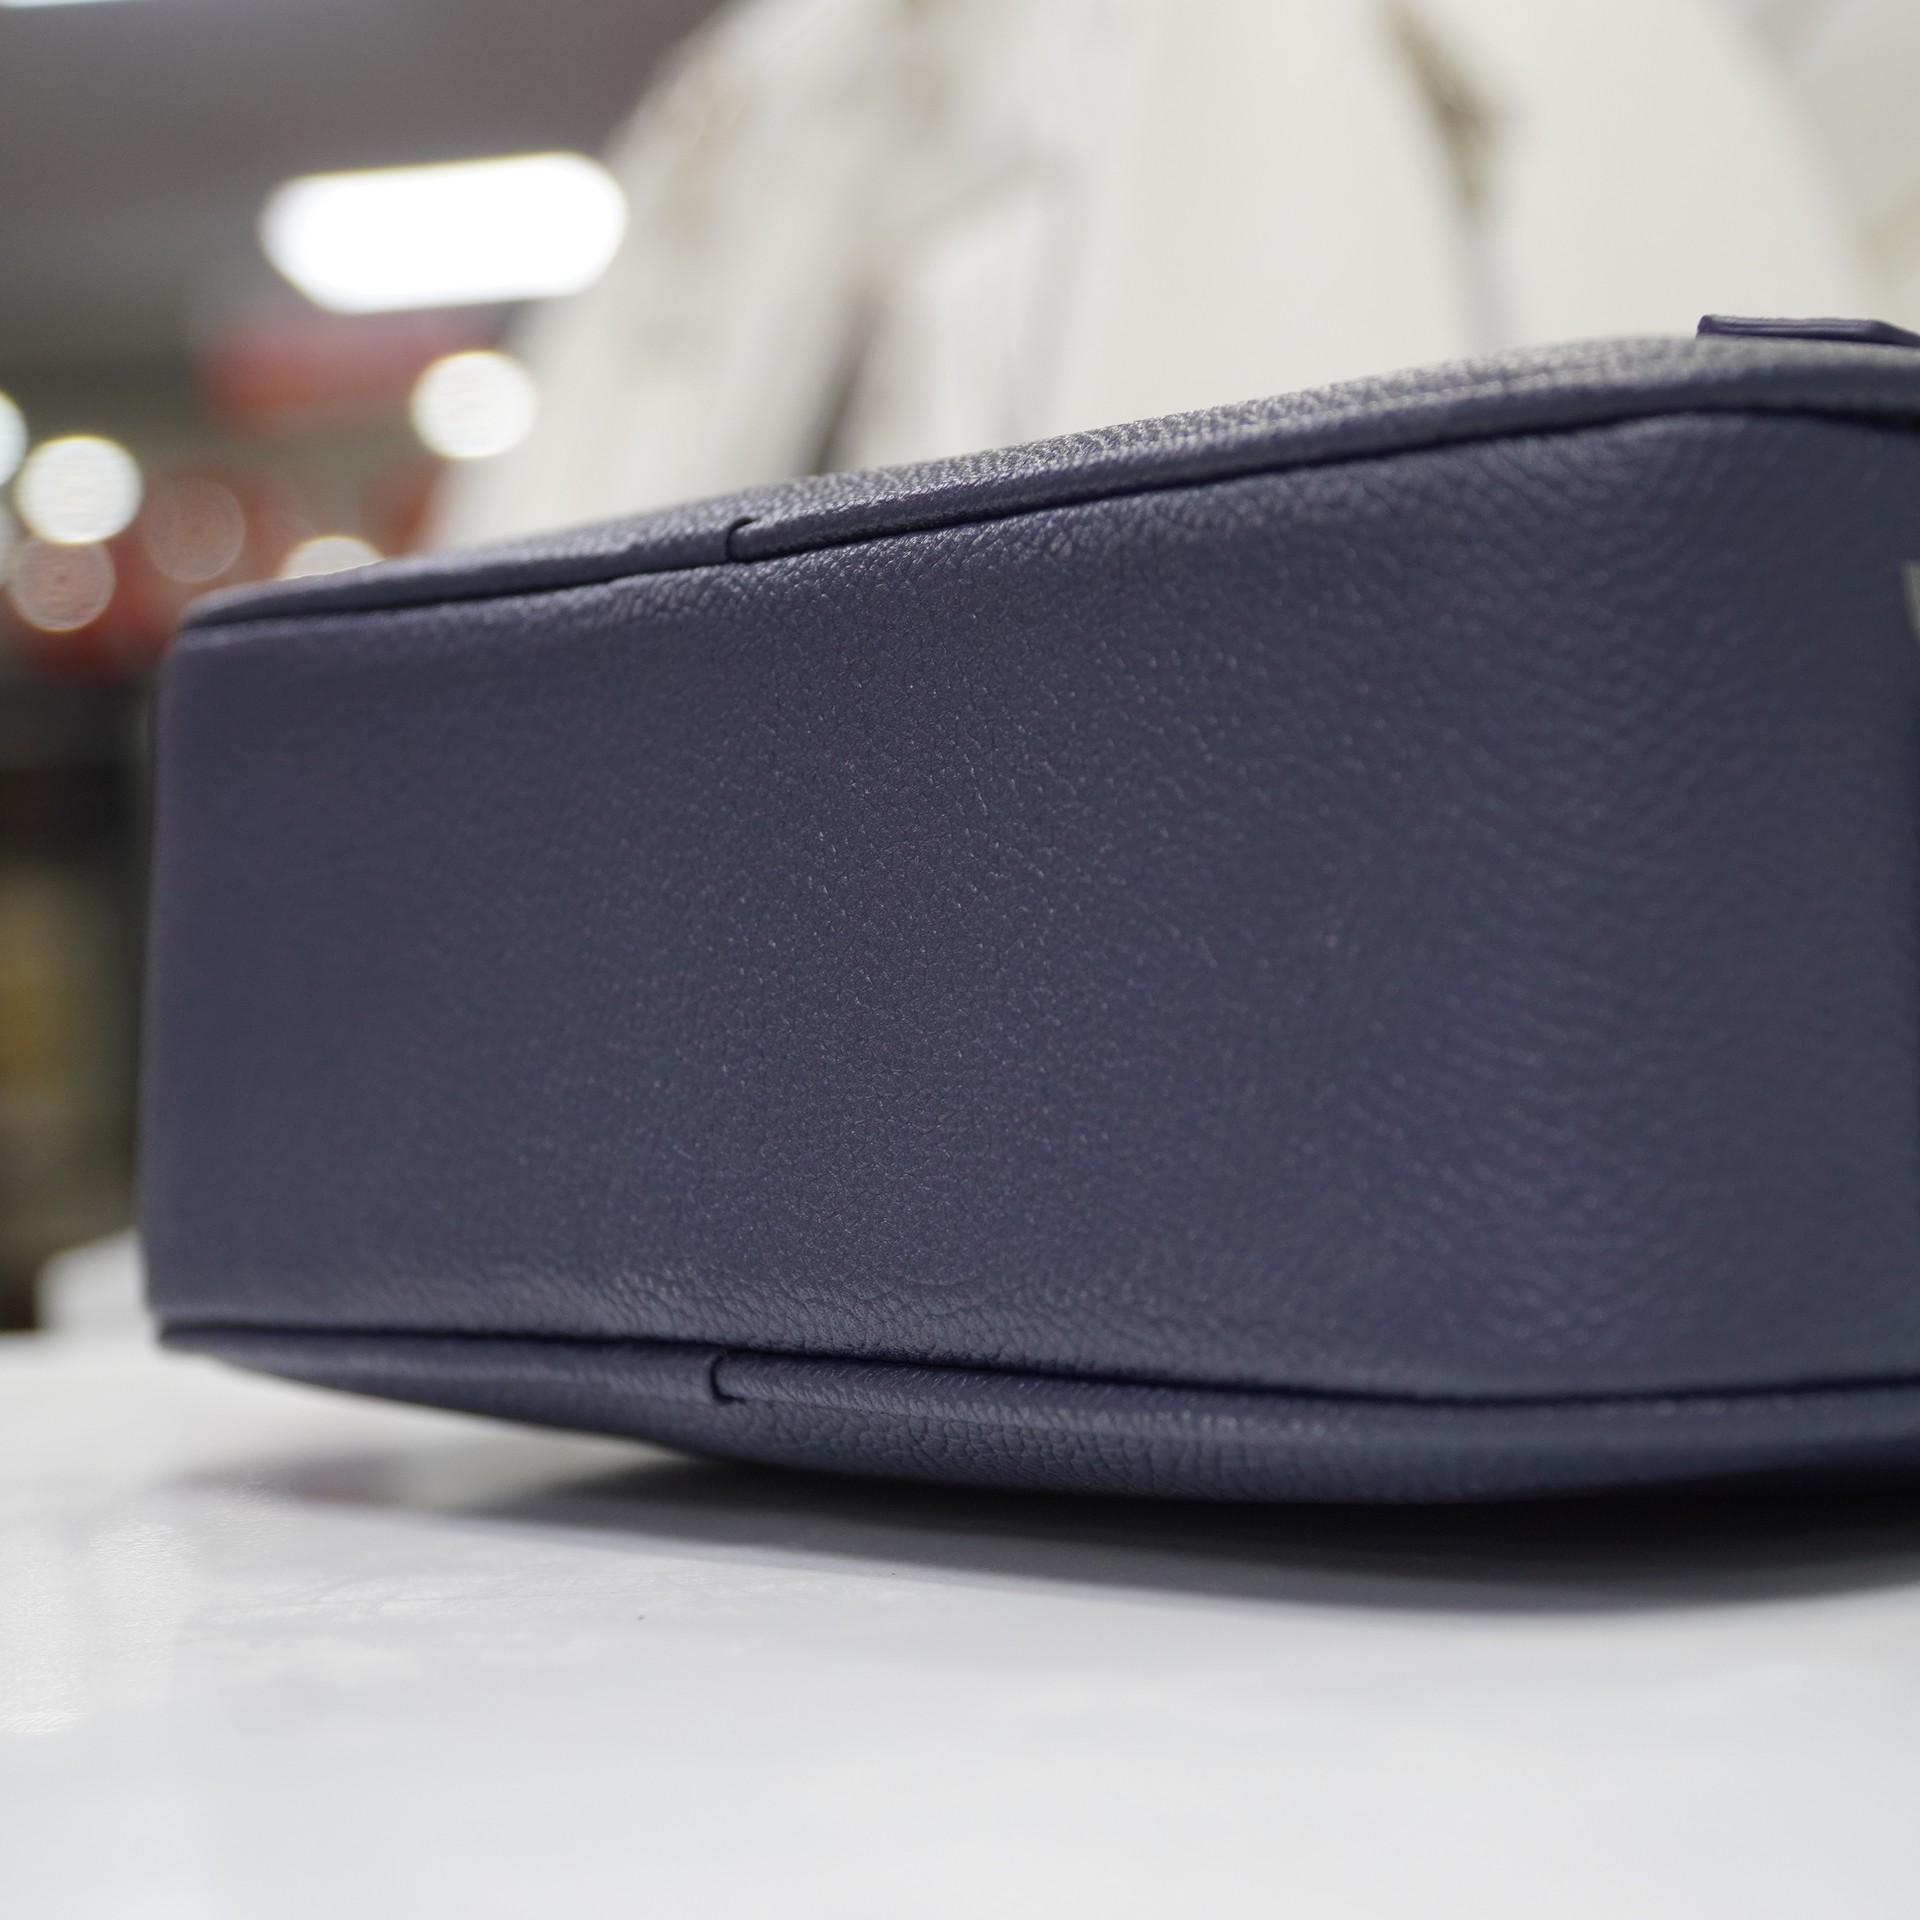 Túi golf cầm tay GolfGroup 5 Sao HBGHV03 2 ngăn